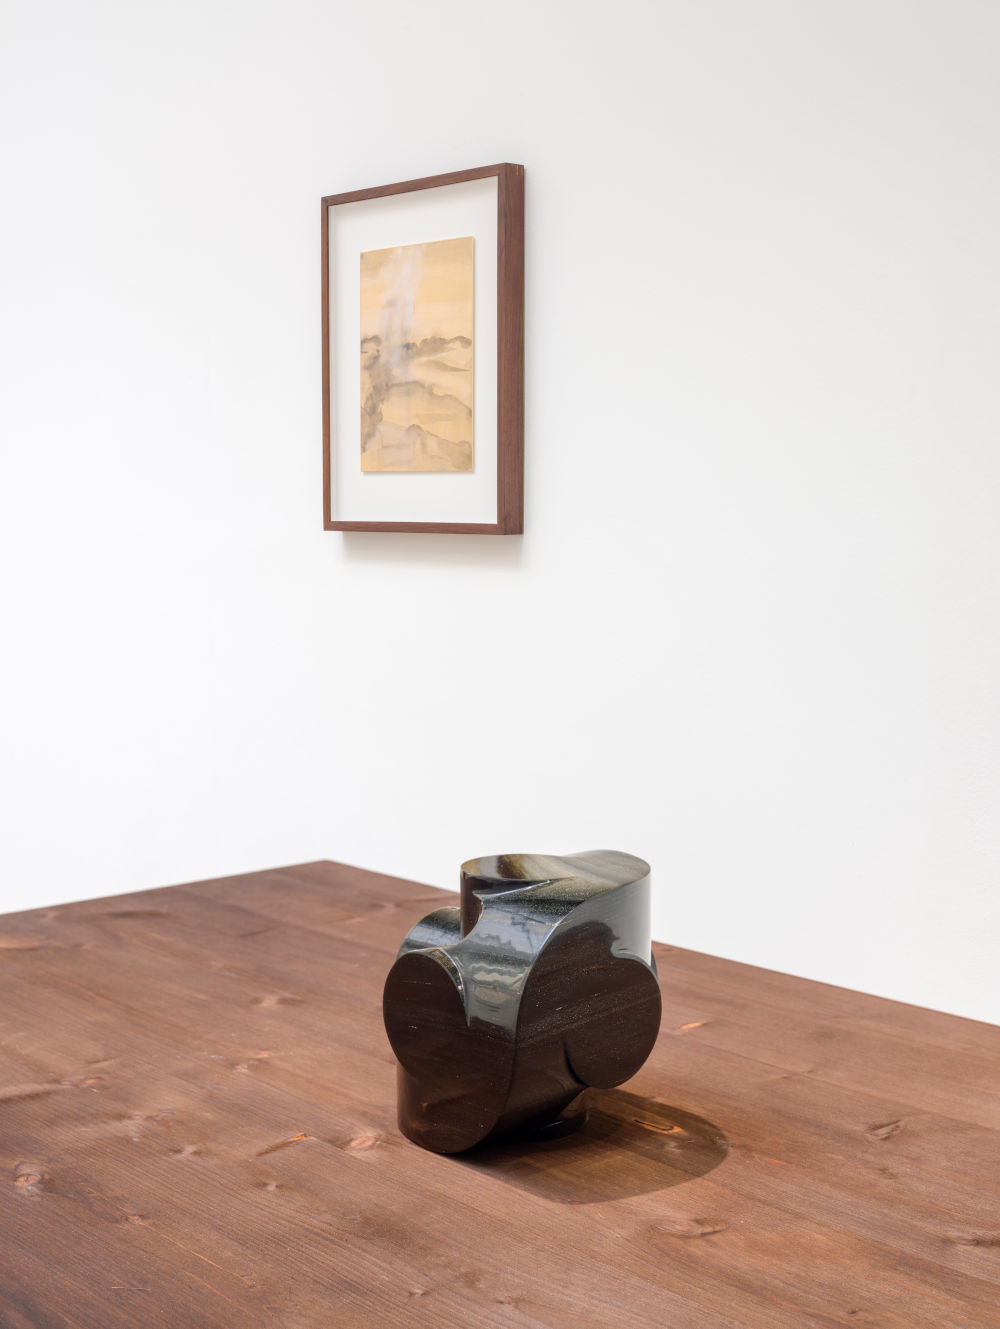 Galerie Chantal Crousel Gabriel Orozco 8